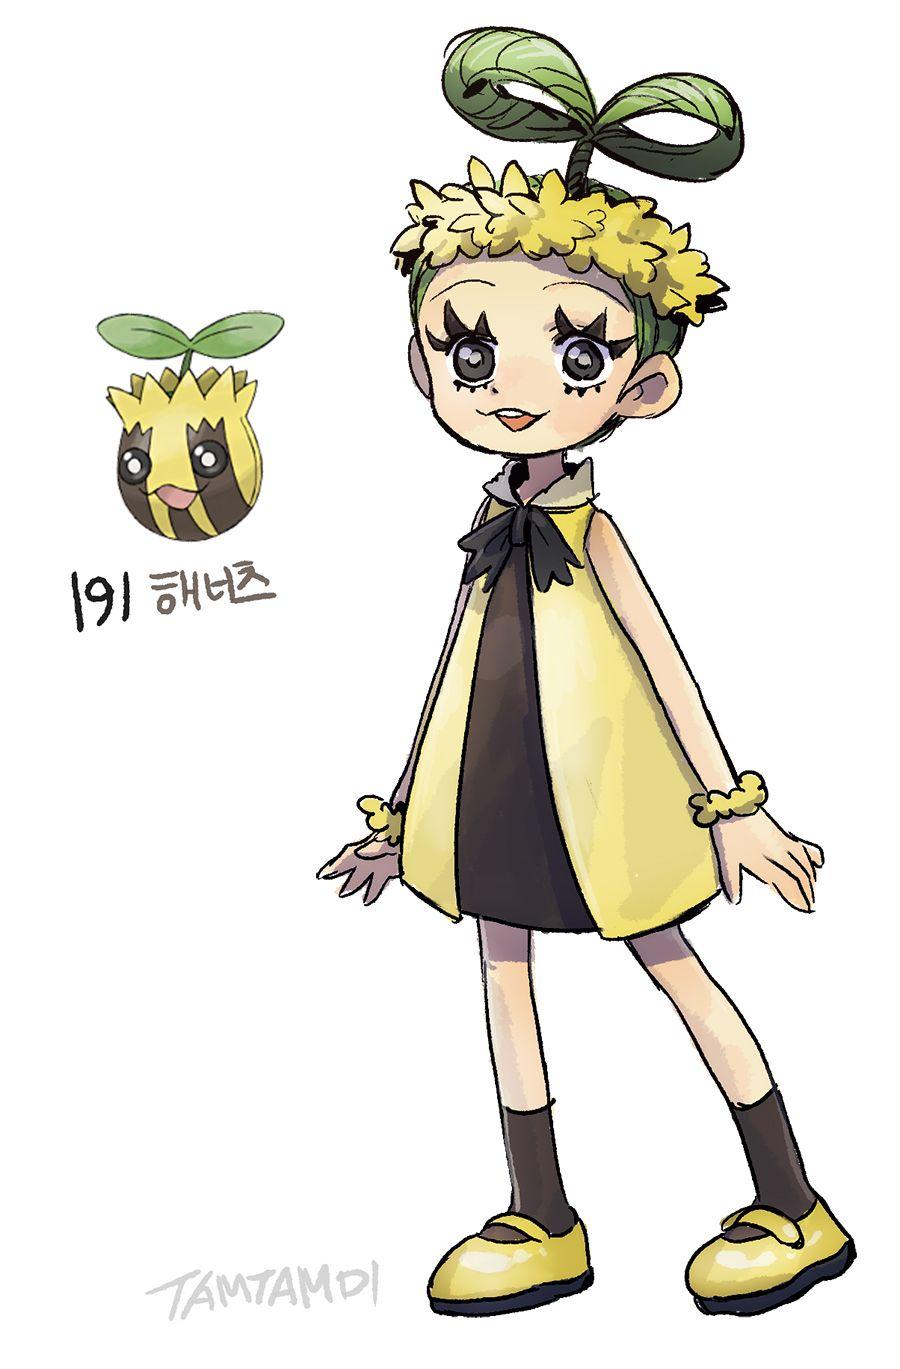 Pokemon Gijinka 191 Sunkern 192 Sunflora Pokemon Gijinkas